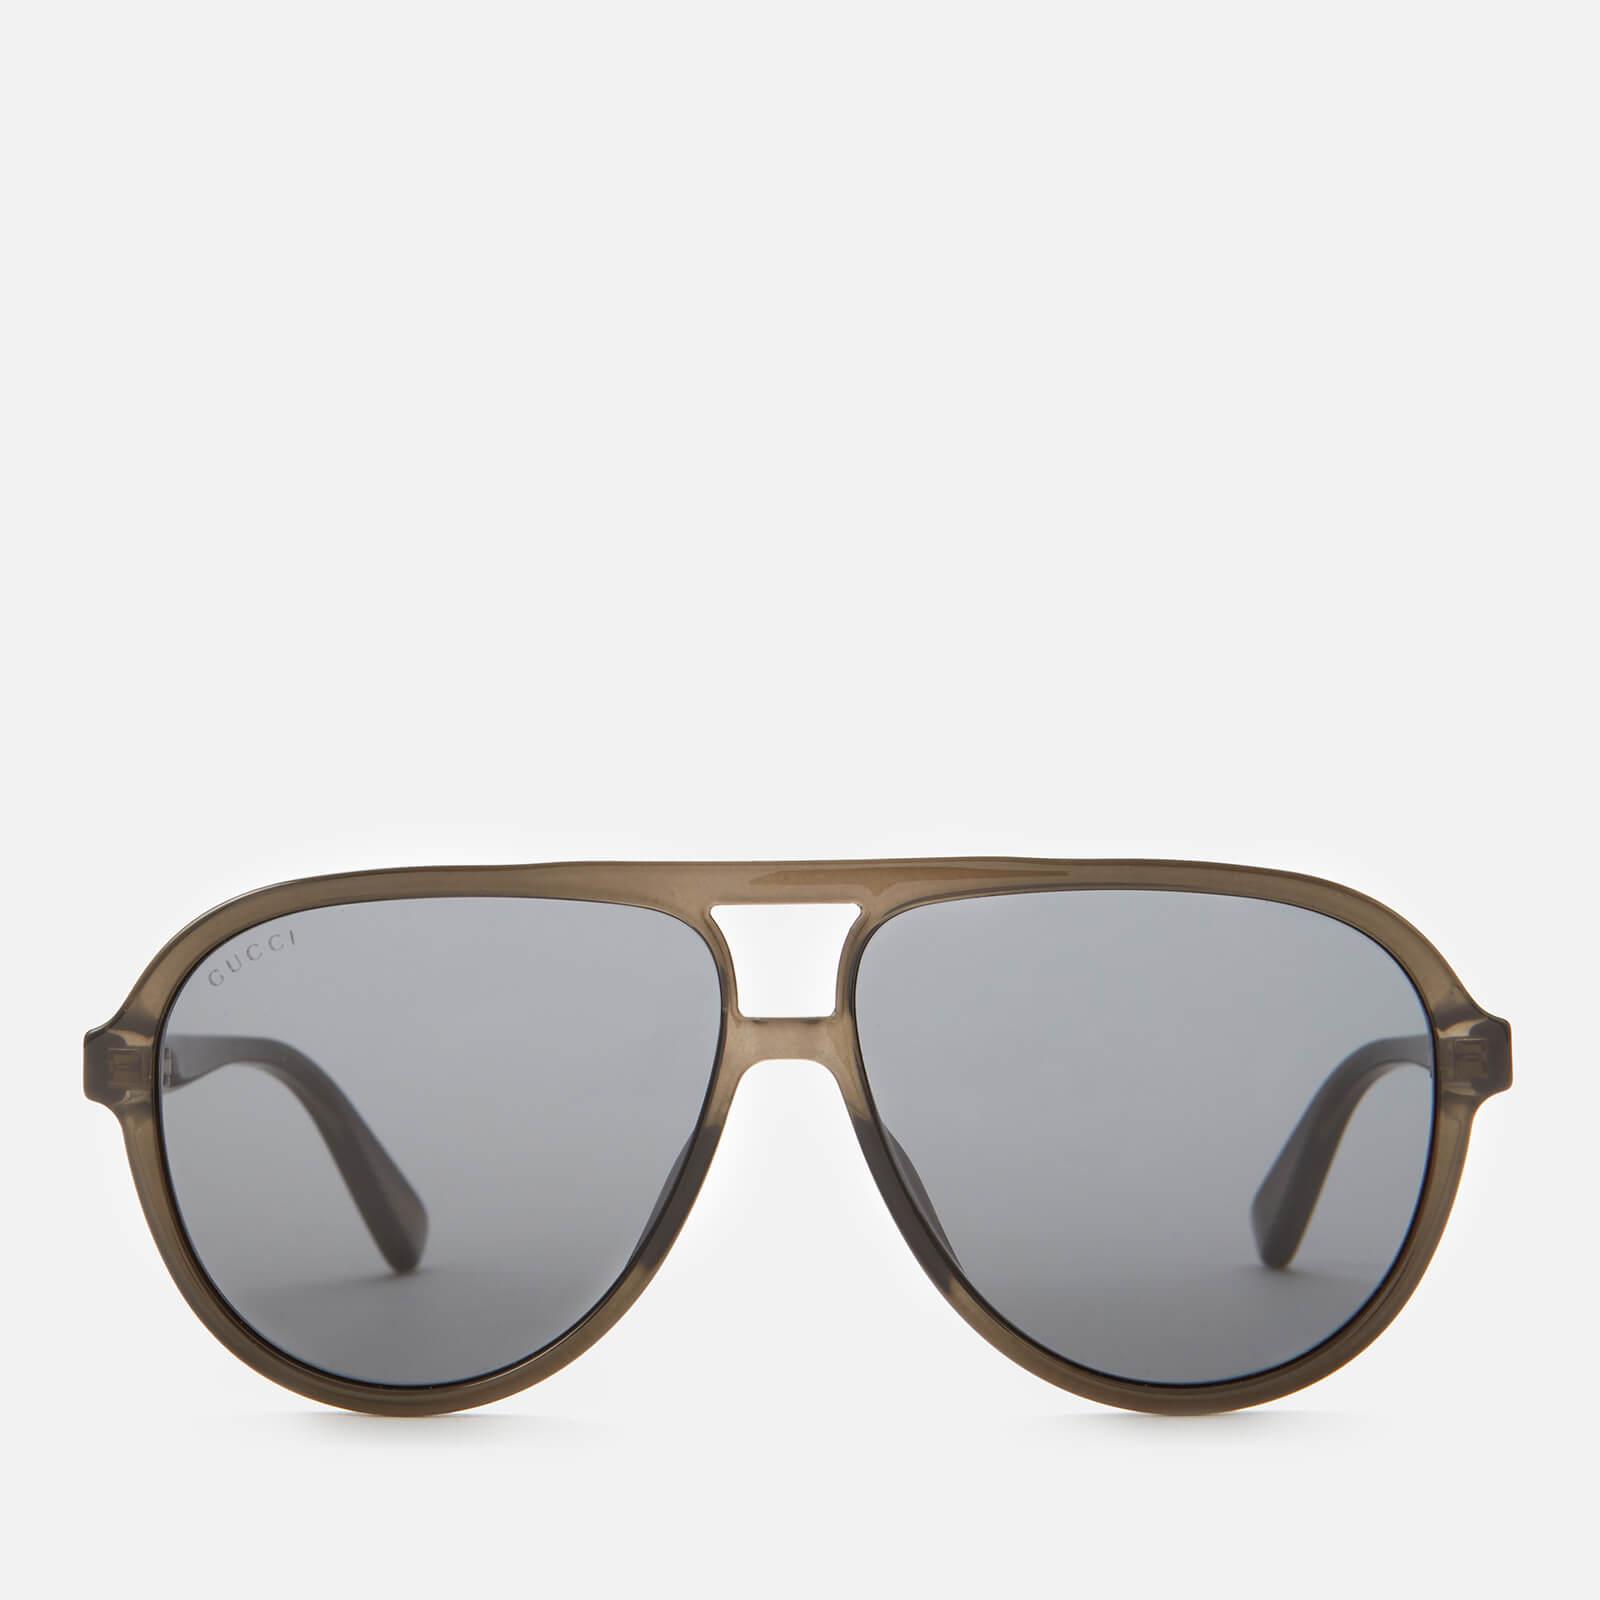 Gucci Men's Aviator Sunglasses - Grey